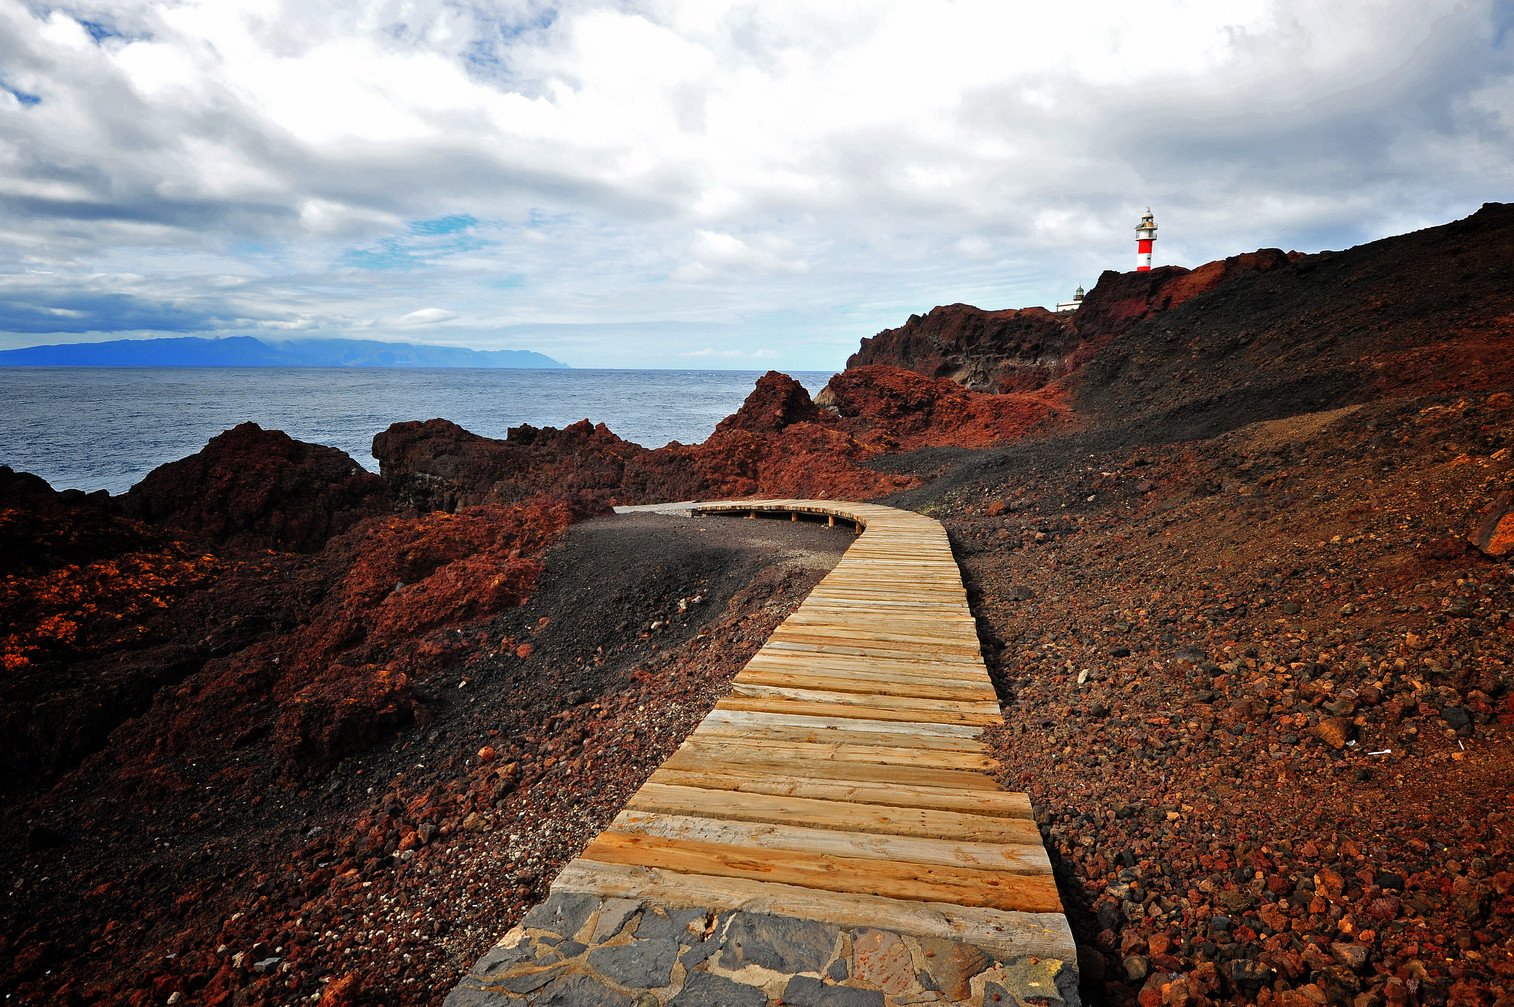 Wooden track at Punta Teno - Tenerife - Canary Islands (Spain)